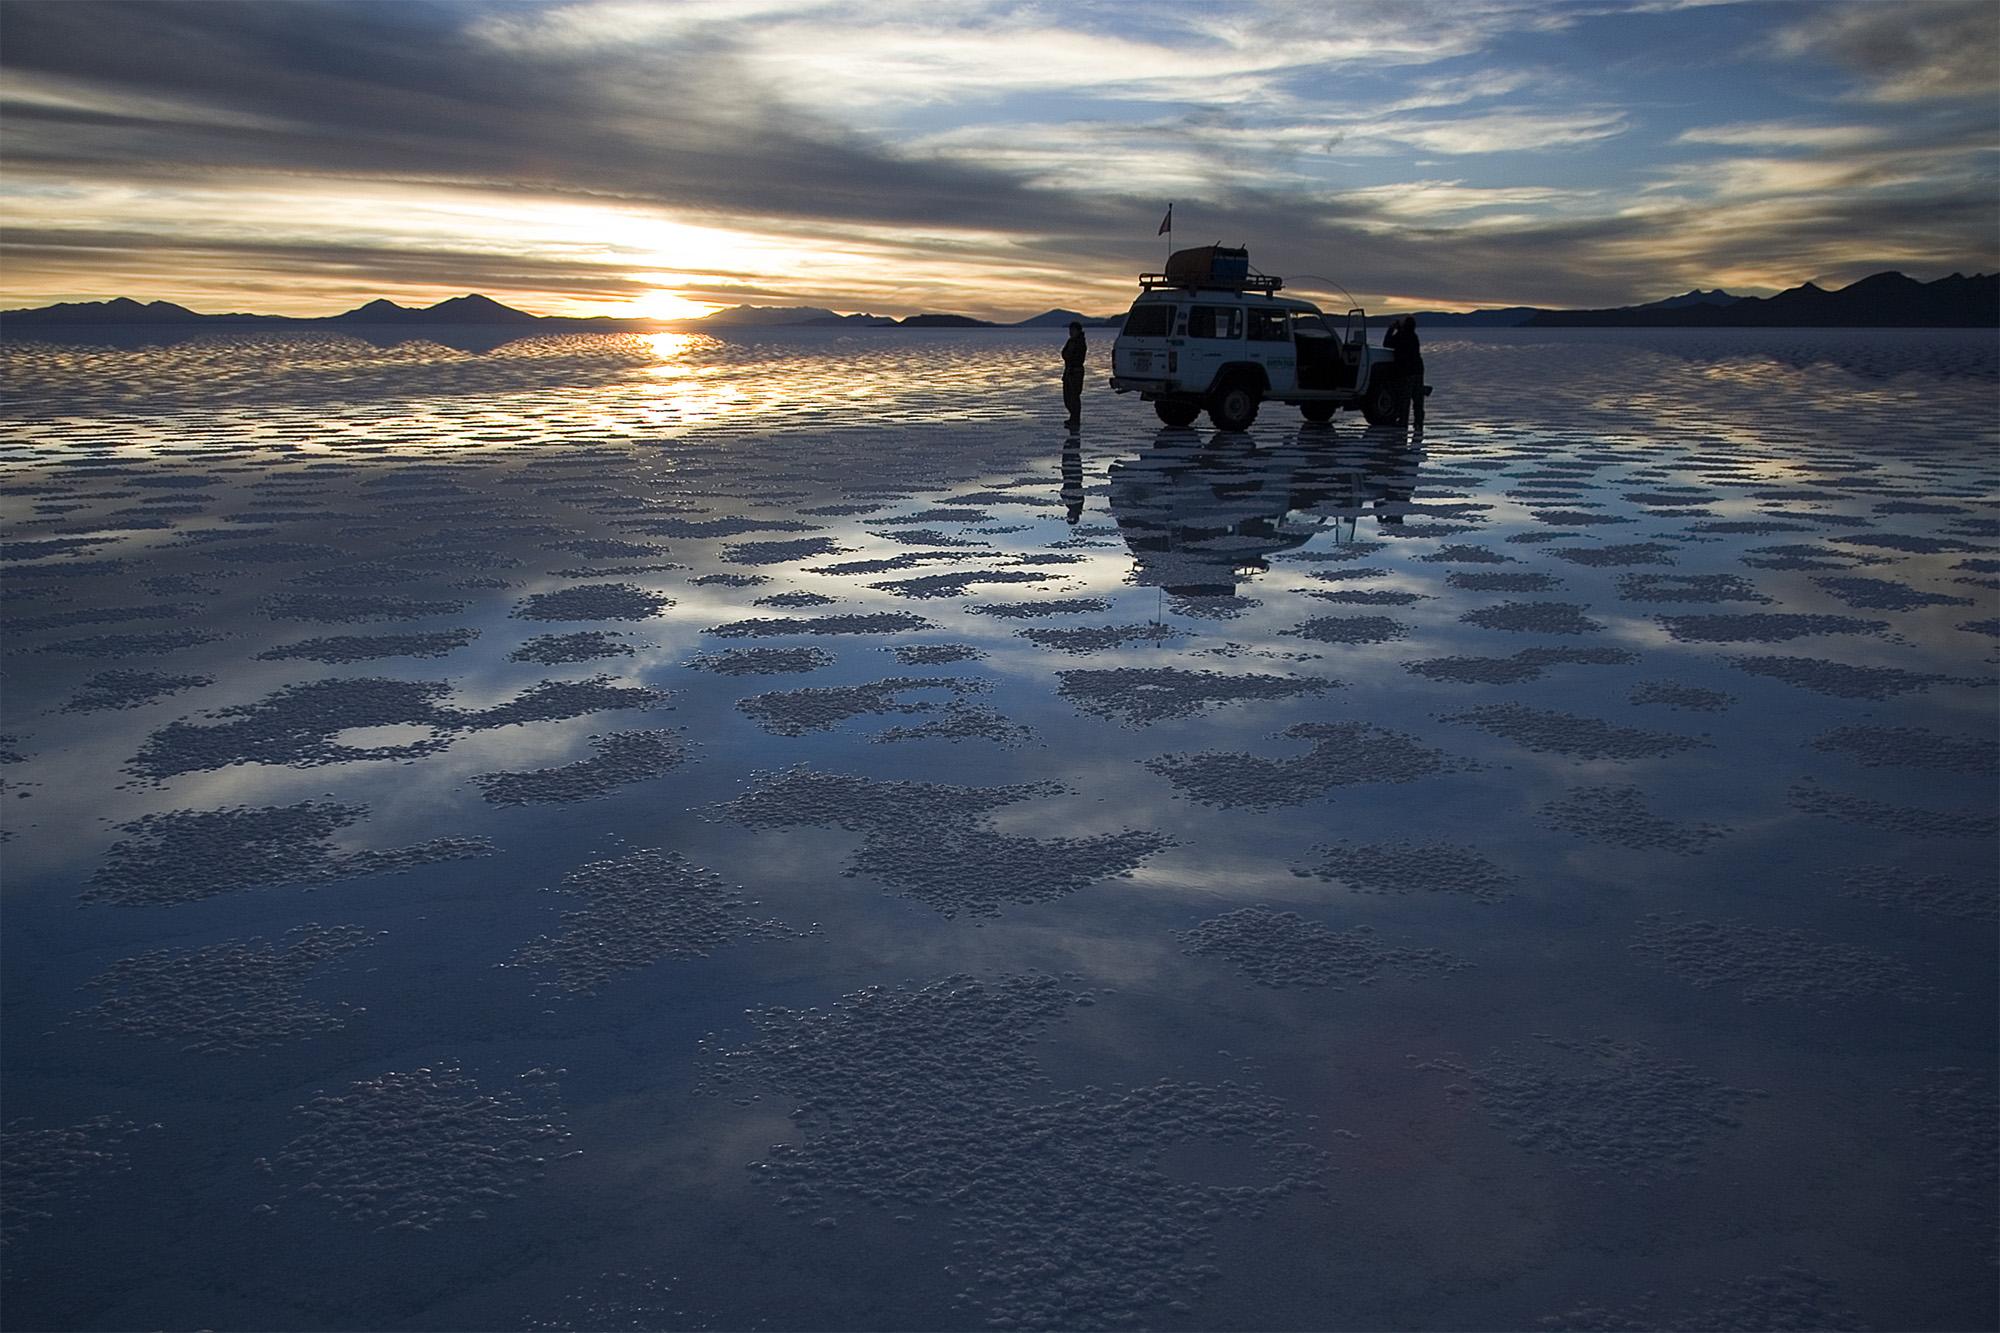 http://upload.wikimedia.org/wikipedia/commons/9/9e/Waiting_Sunset_Salar_de_Uyuni_Bolivia_Luca_Galuzzi_2006.jpg